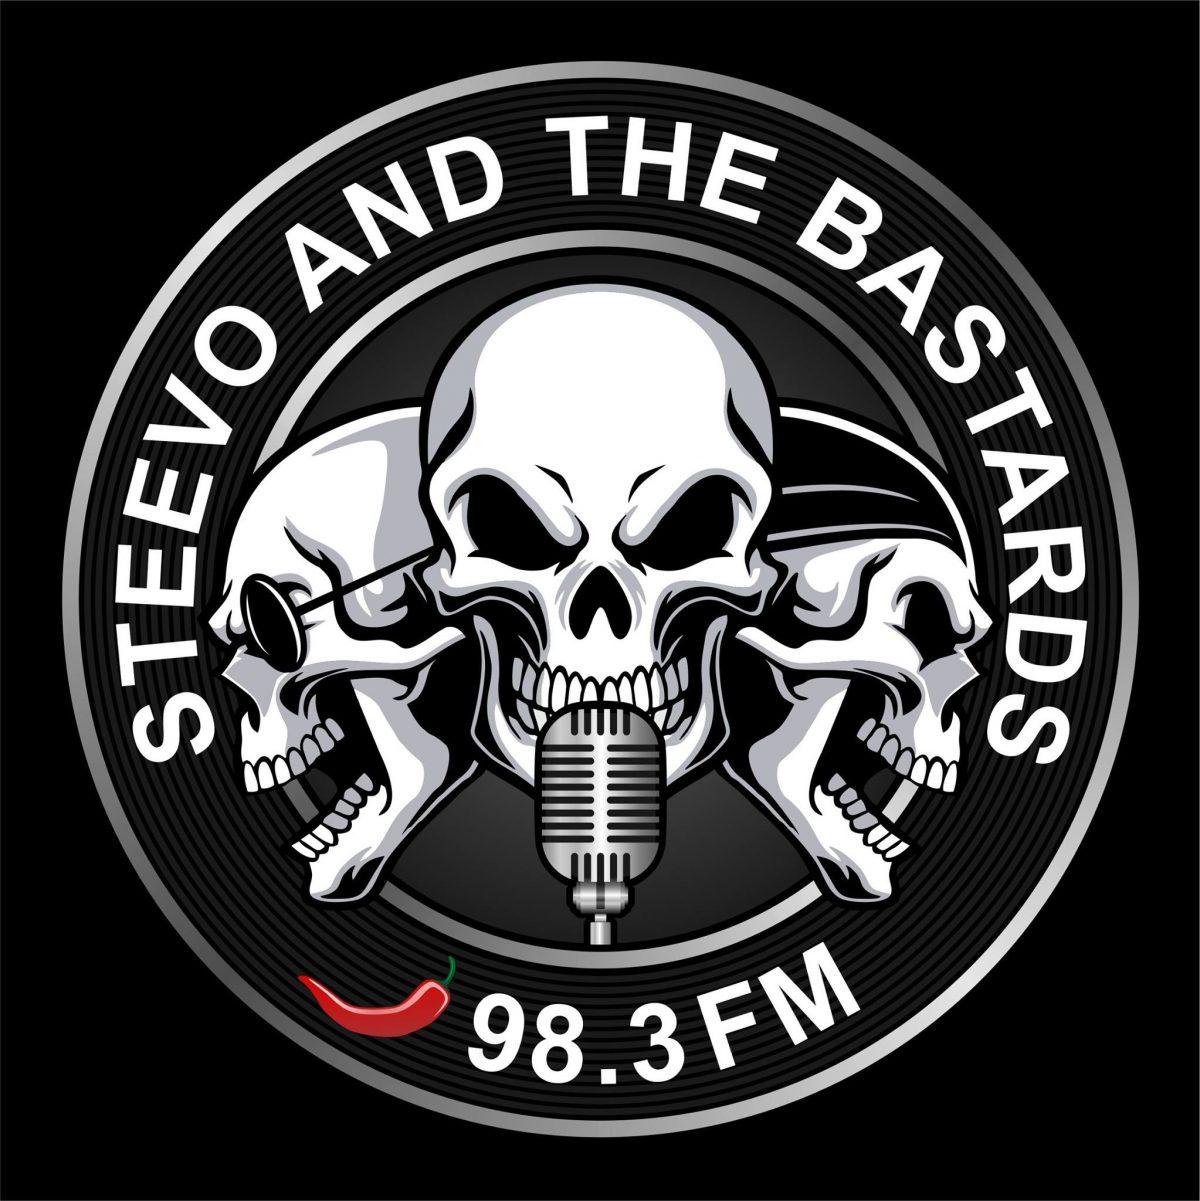 Steevo And The Bastards on 98.3 FM WROGN Radio!